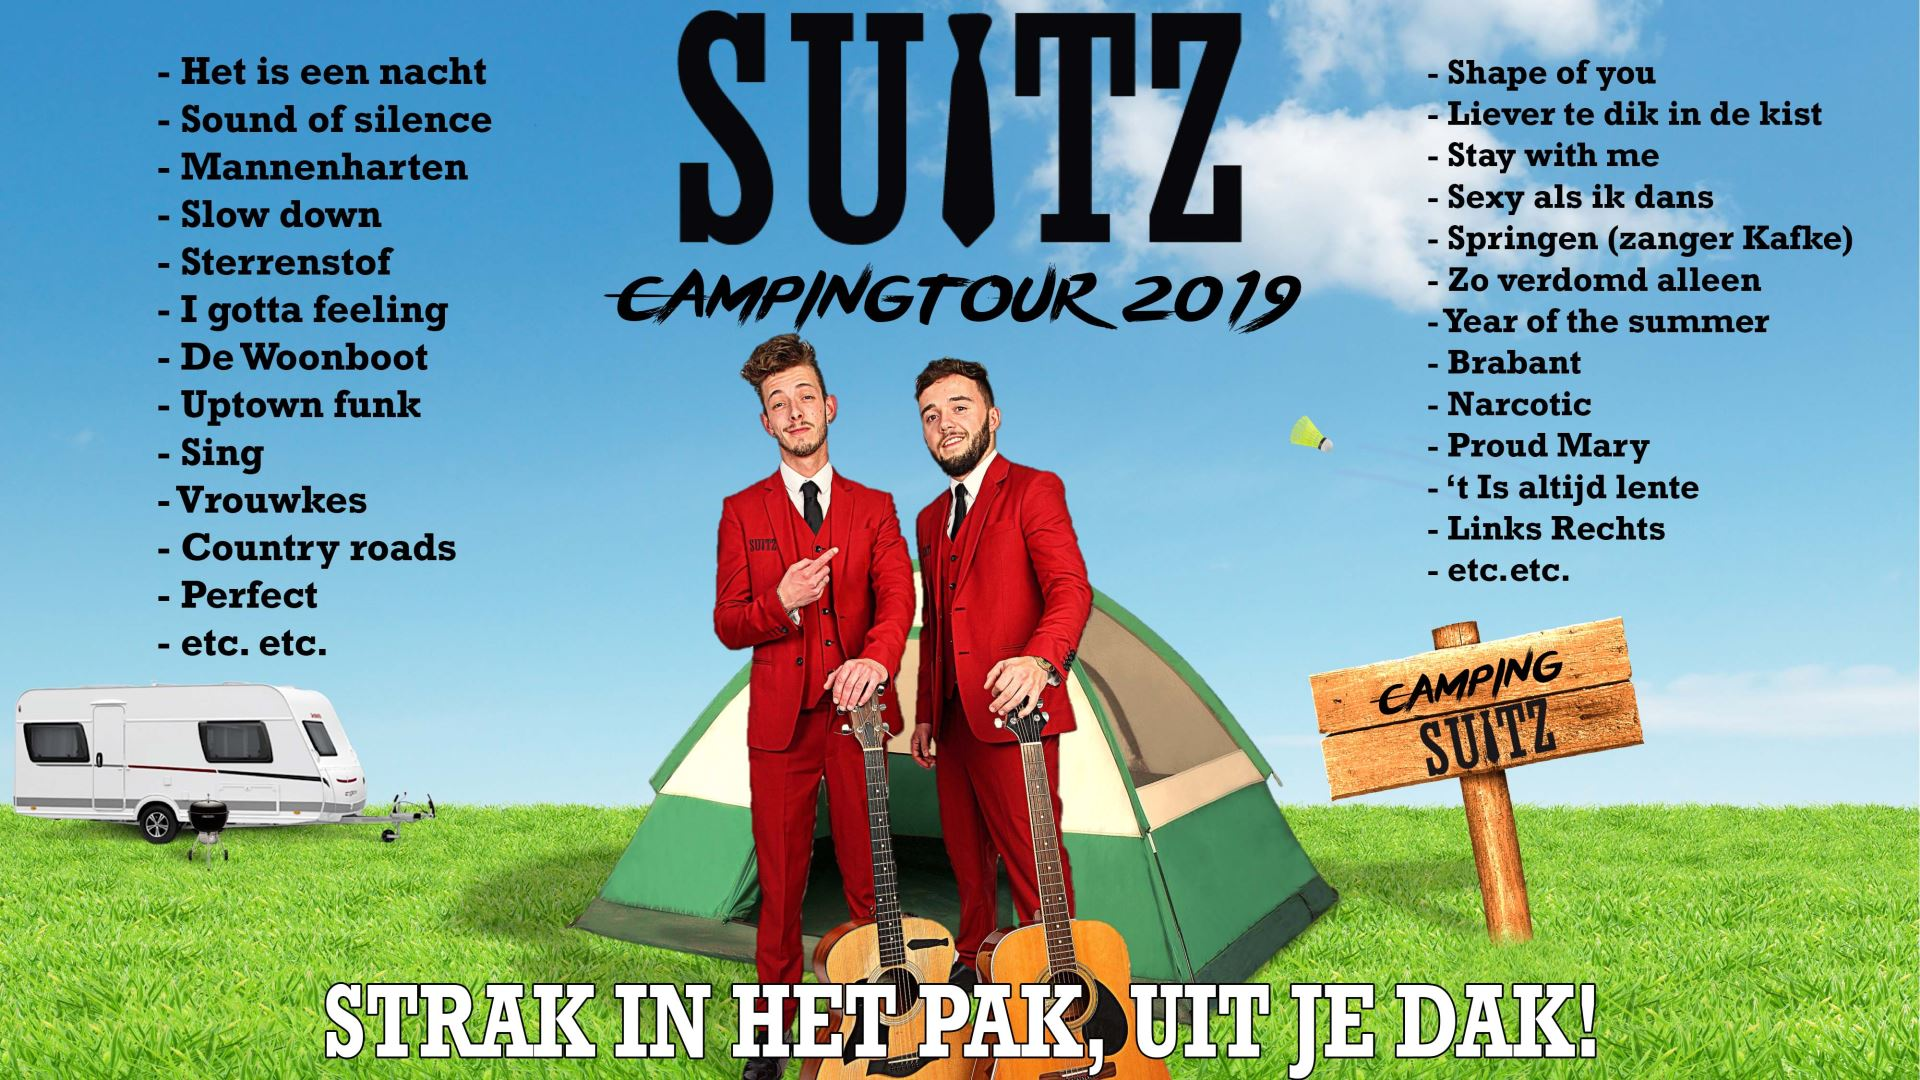 SUITZ_Campingtour